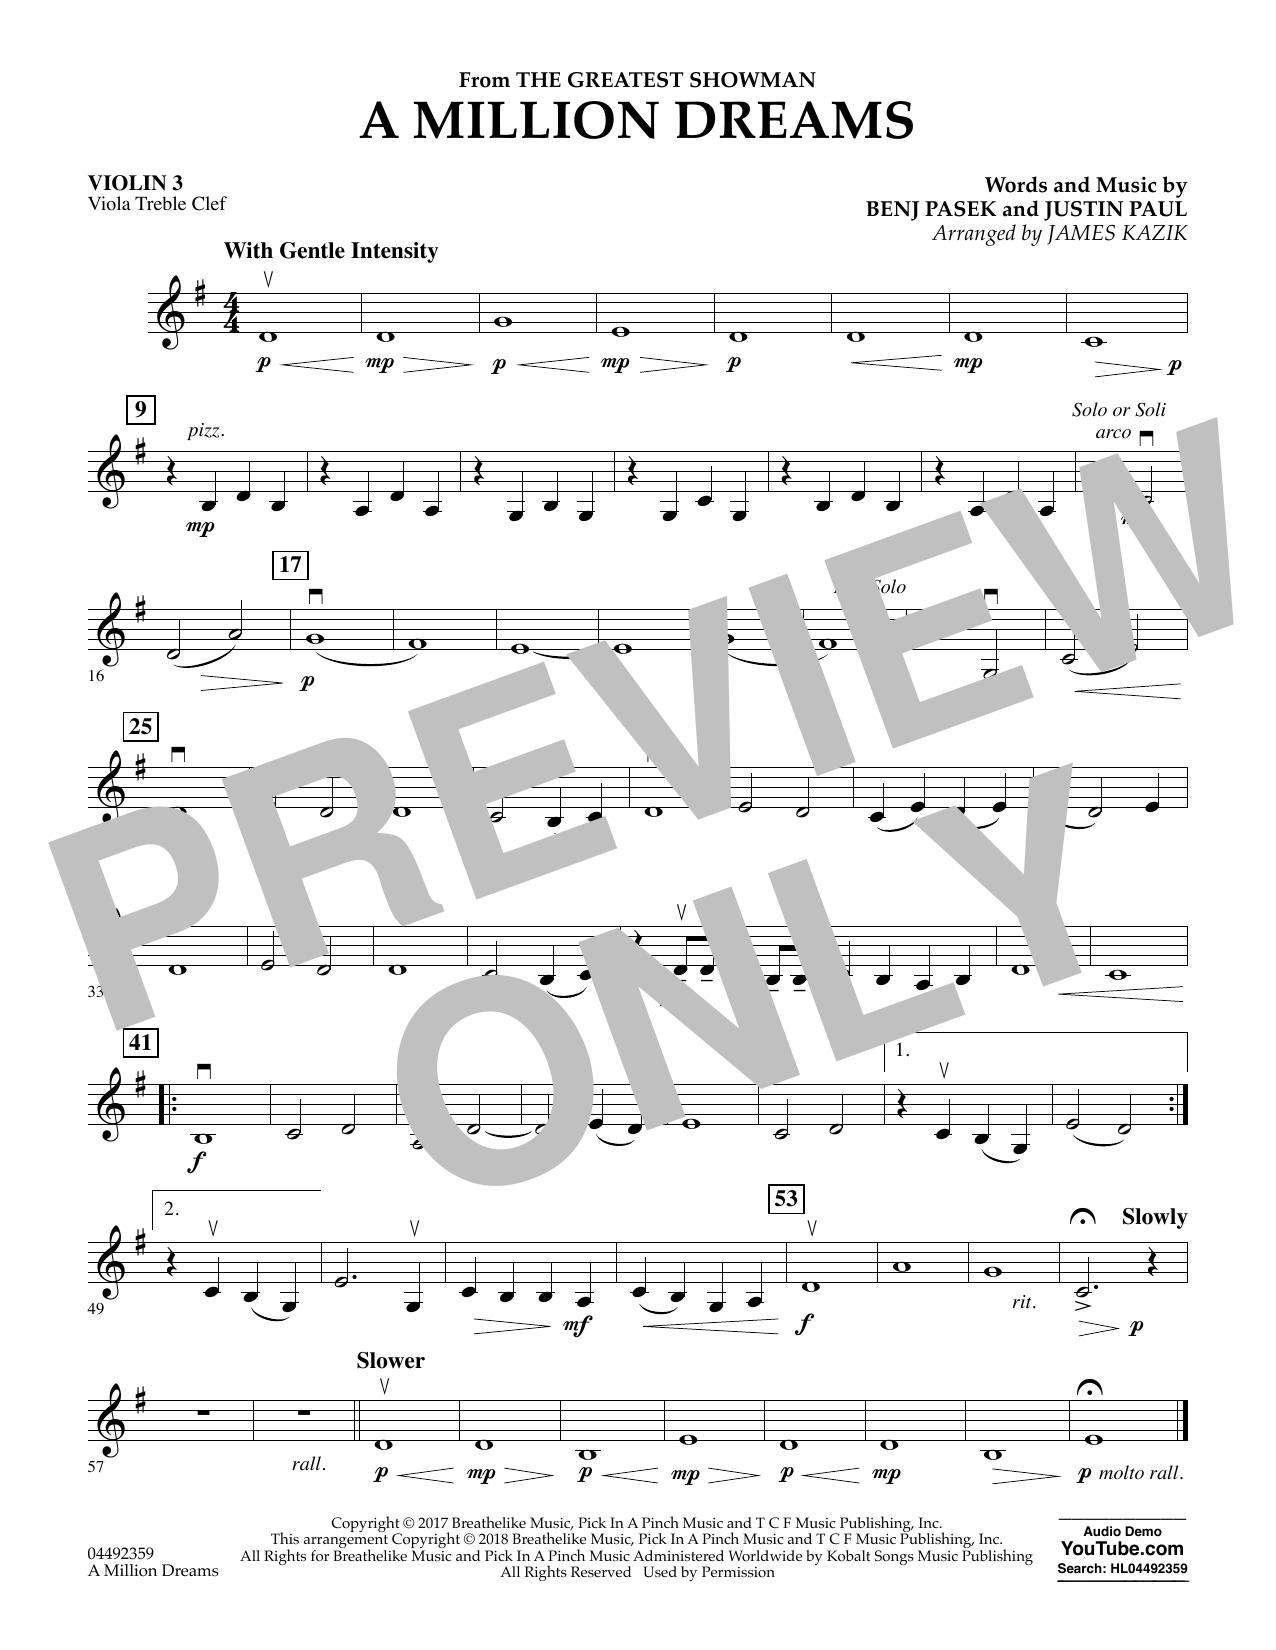 A Million Dreams (from The Greatest Showman) (arr. James Kazik) - Violin 3 (Viola Treble Clef) (Orchestra)